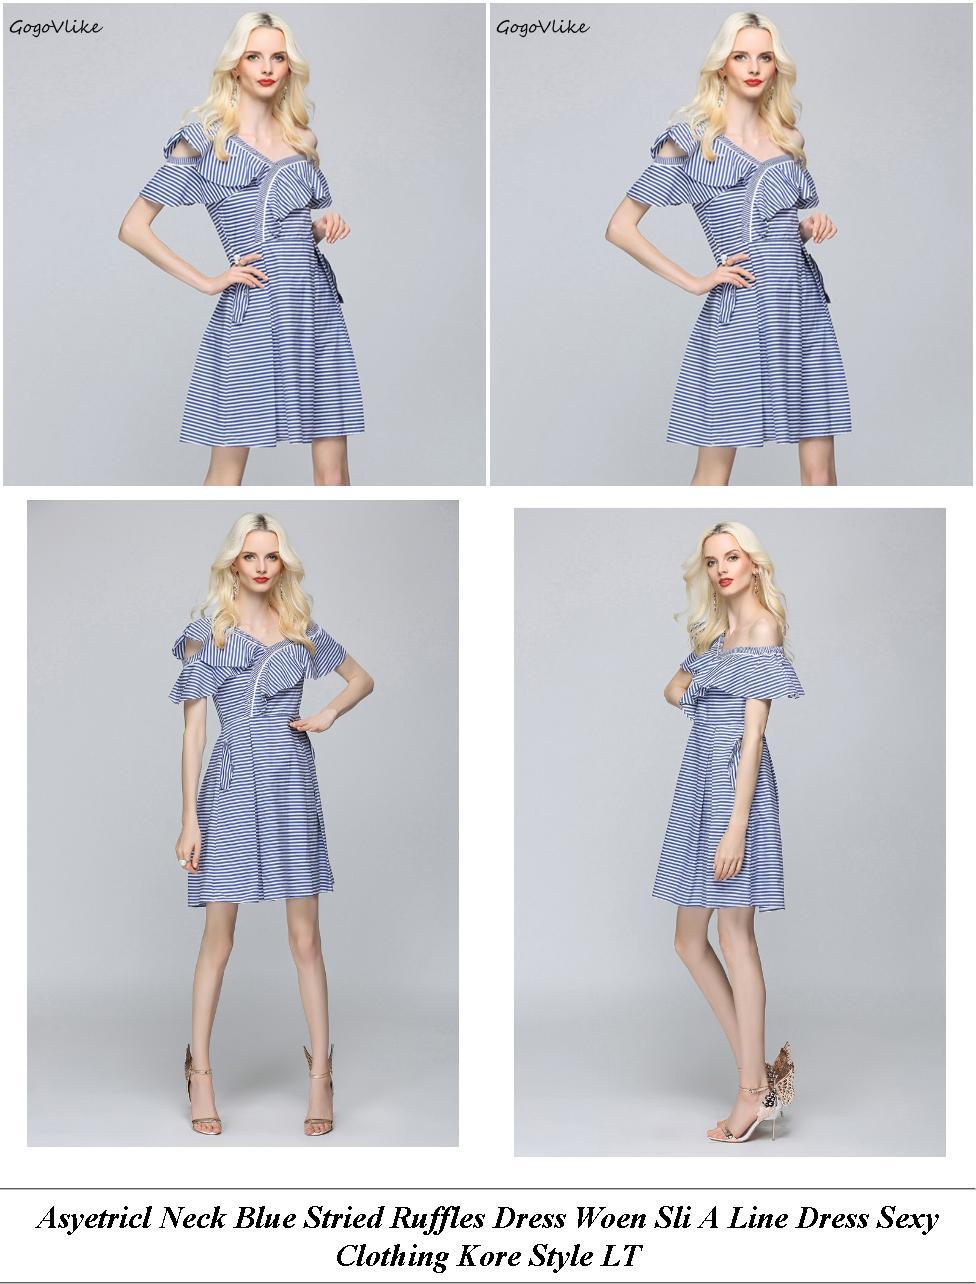 Elegant Evening Dresses Uk - Designer Clothes Store Online - Eautiful Dresses Uk